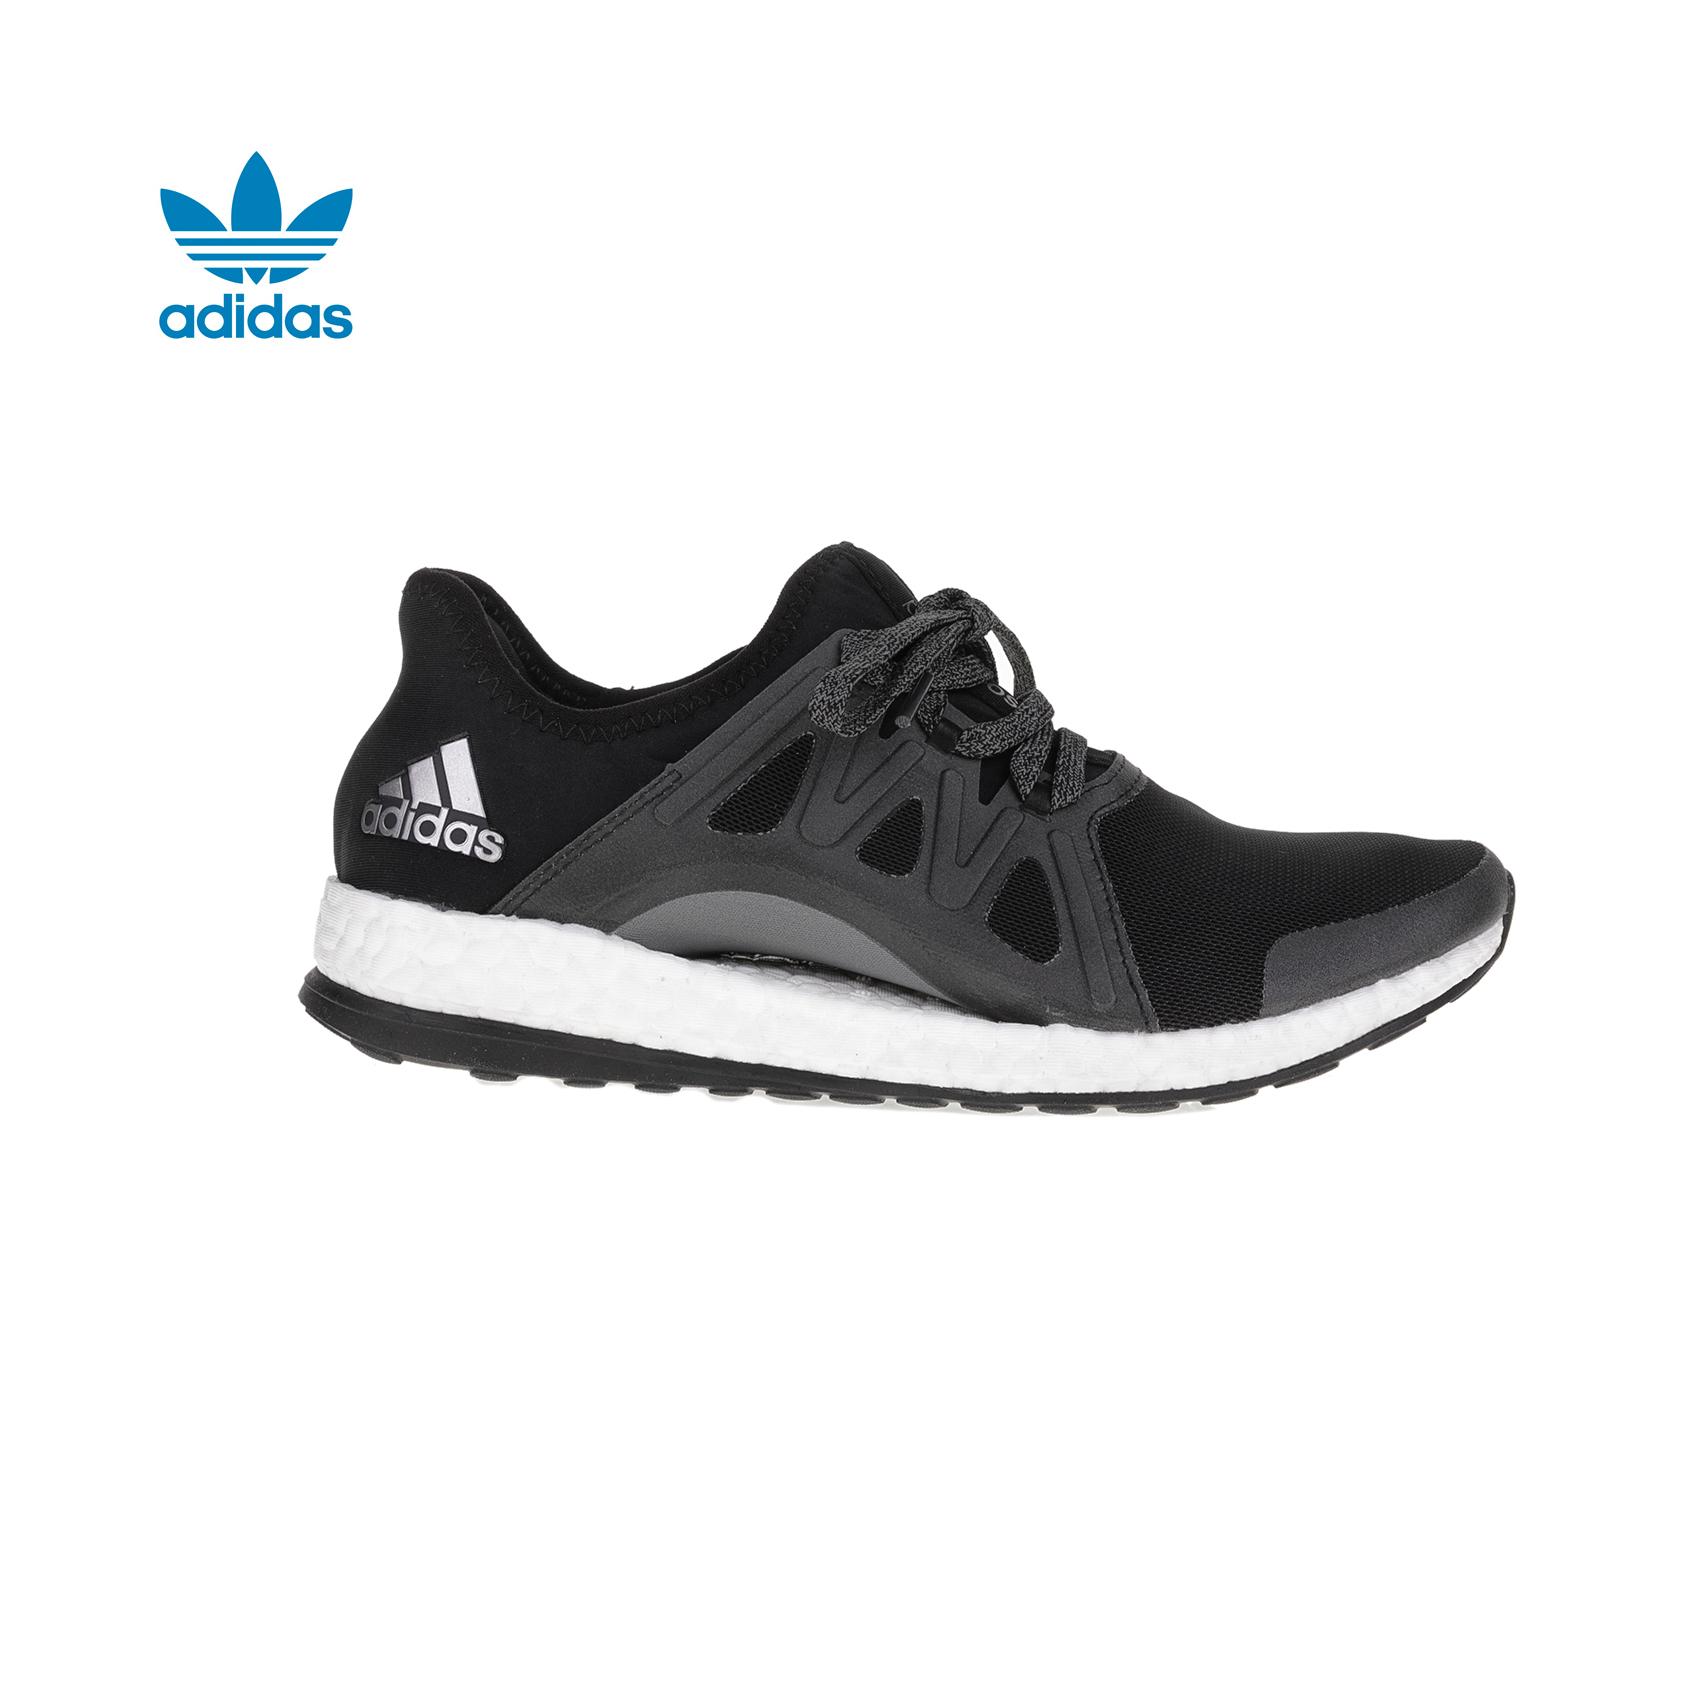 adidas Originals - Γυναικεία παπούτσια adidas PureBOOST X 2 μαύρα γυναικεία παπούτσια αθλητικά running